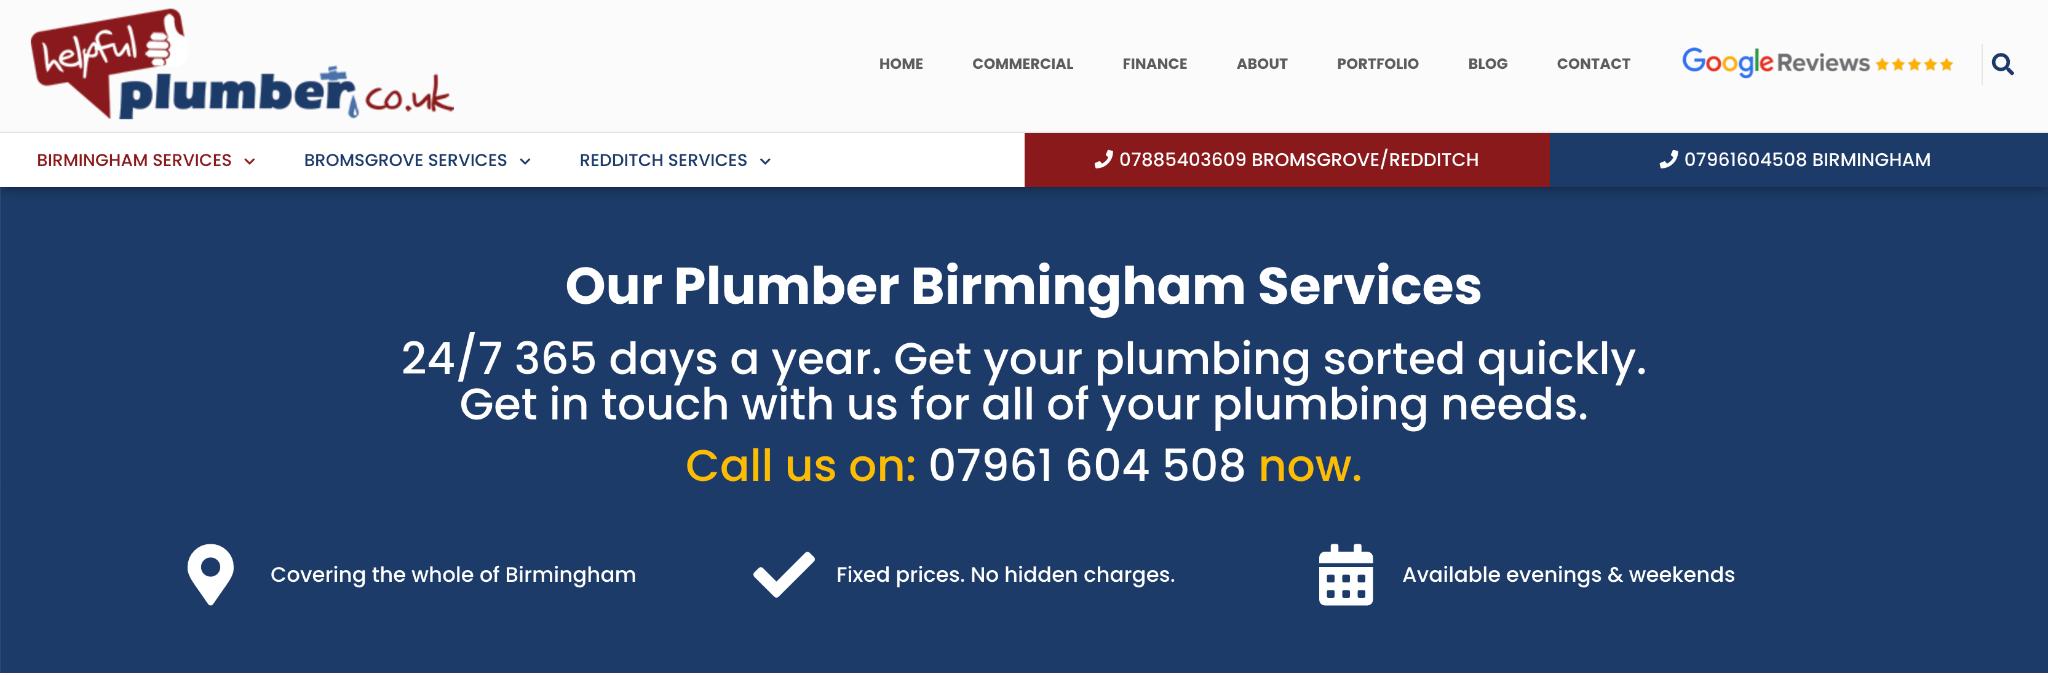 Birmingham Local Landing Page Example